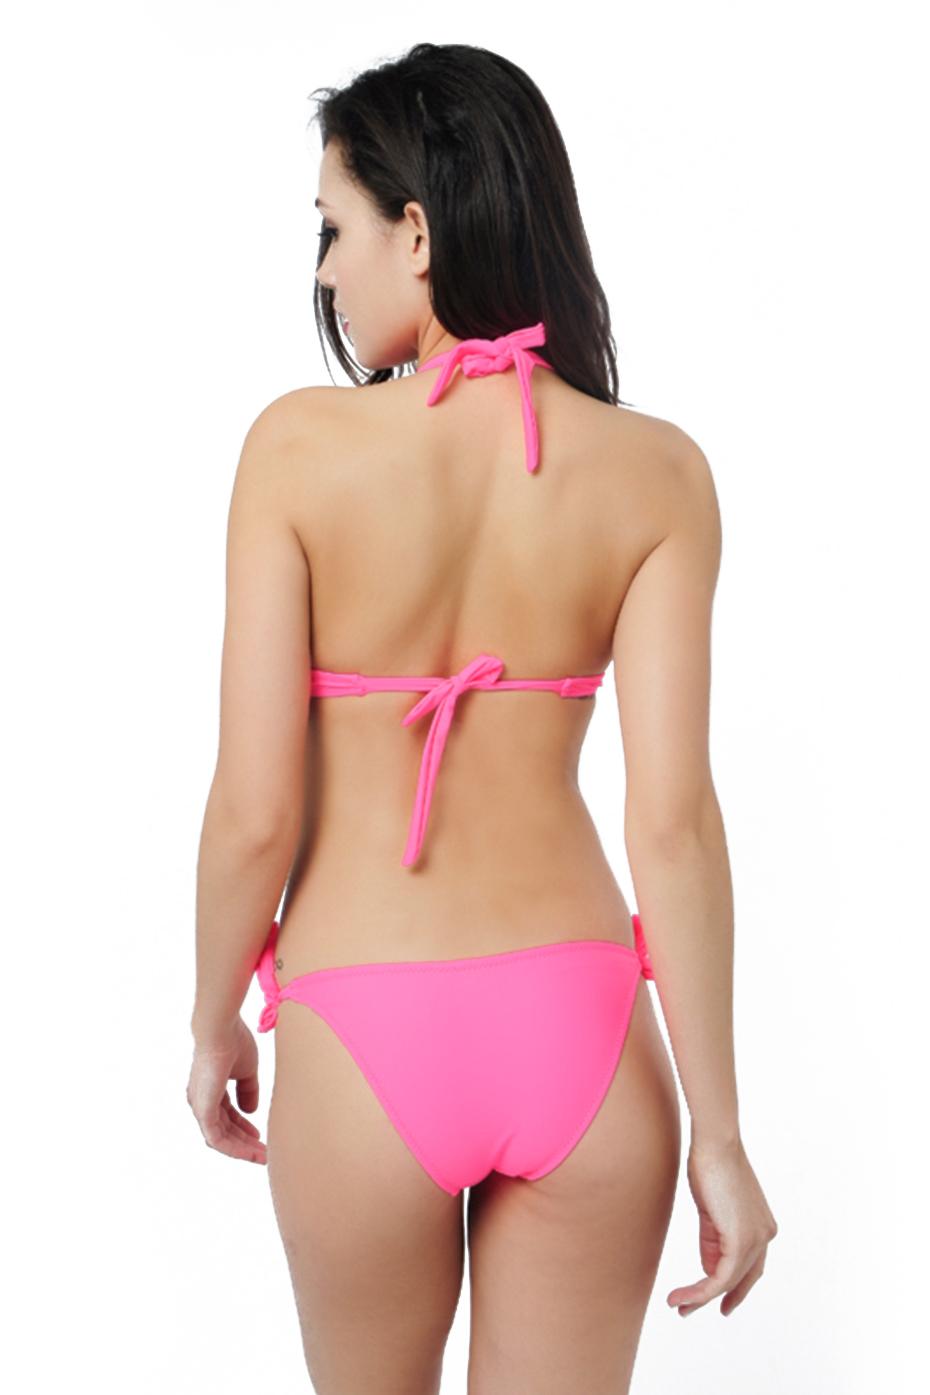 Faerdasi Halter Bikini Set Low Waist Bathing Suits Women Sexy Push Up Beachwear with Tie Side and Center Bow Swimwear Swimsuit 35